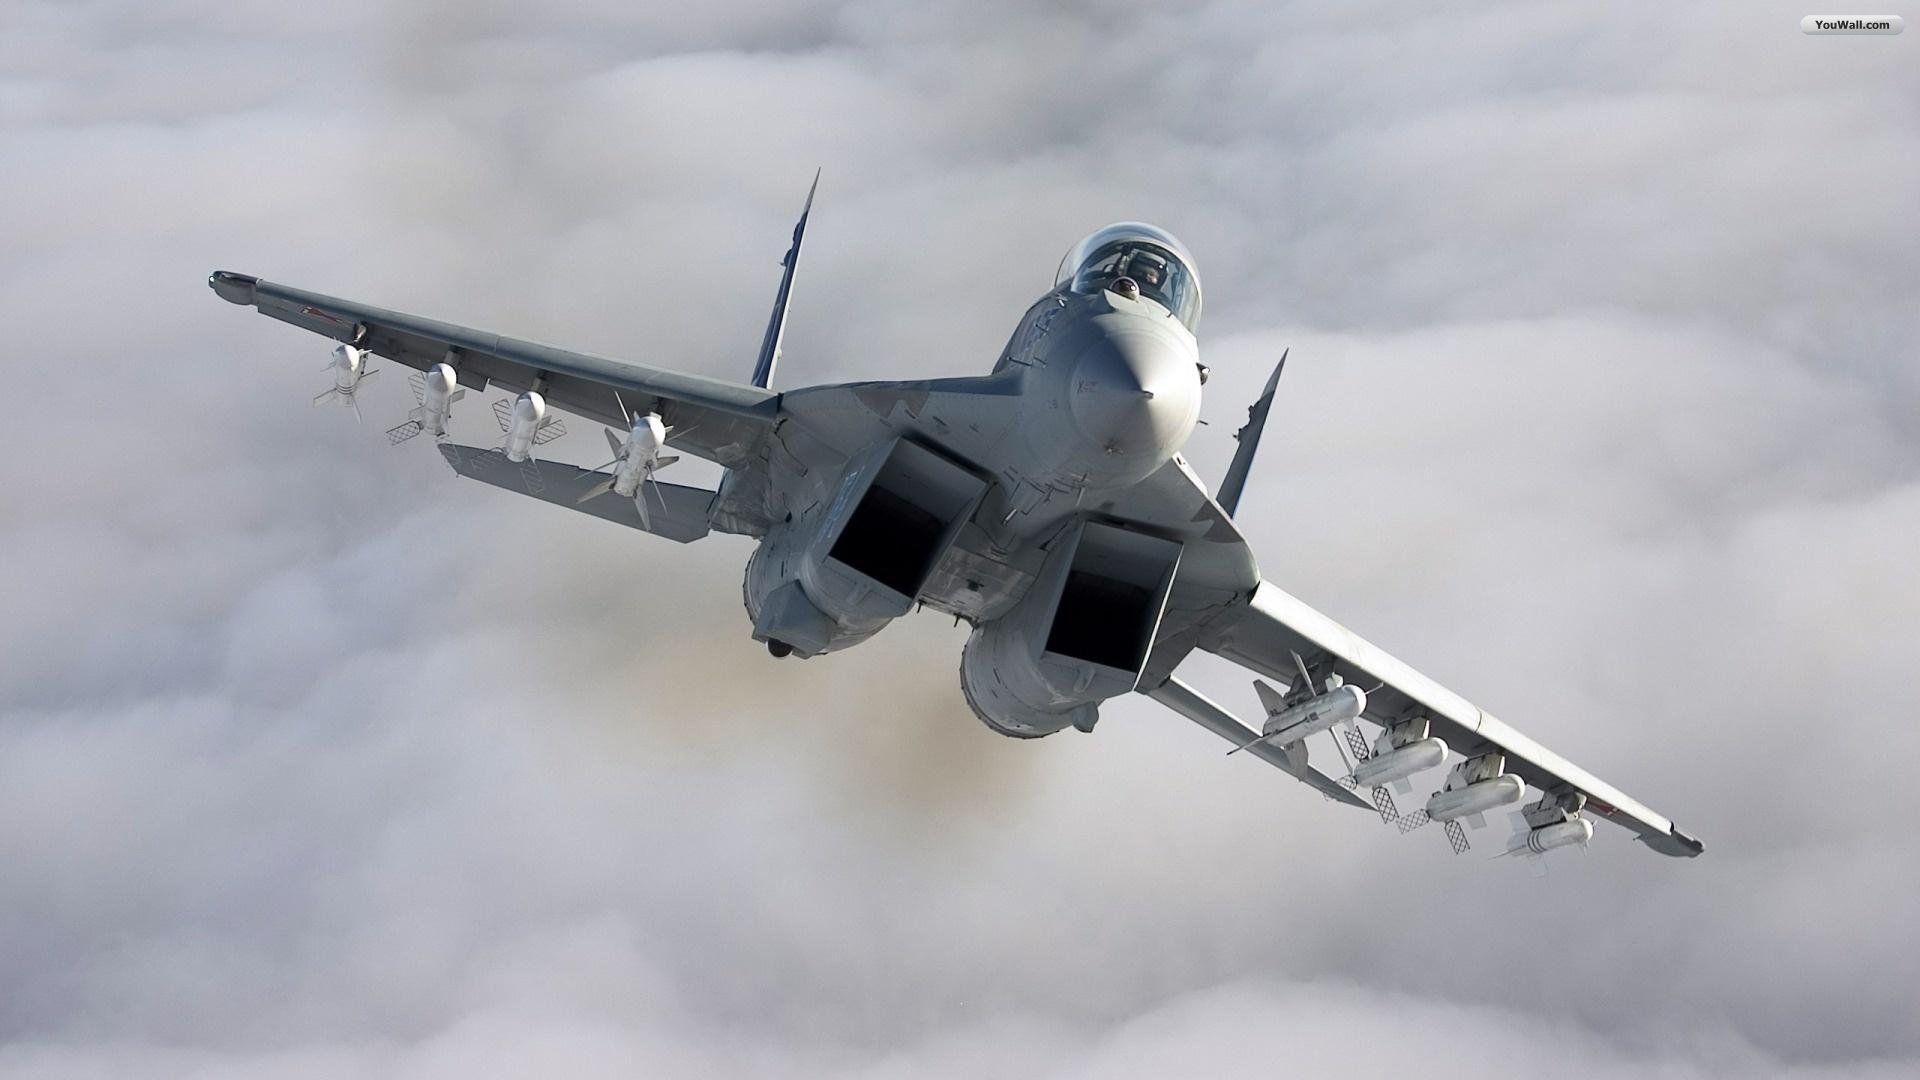 F18 Super Hornet Wallpaper